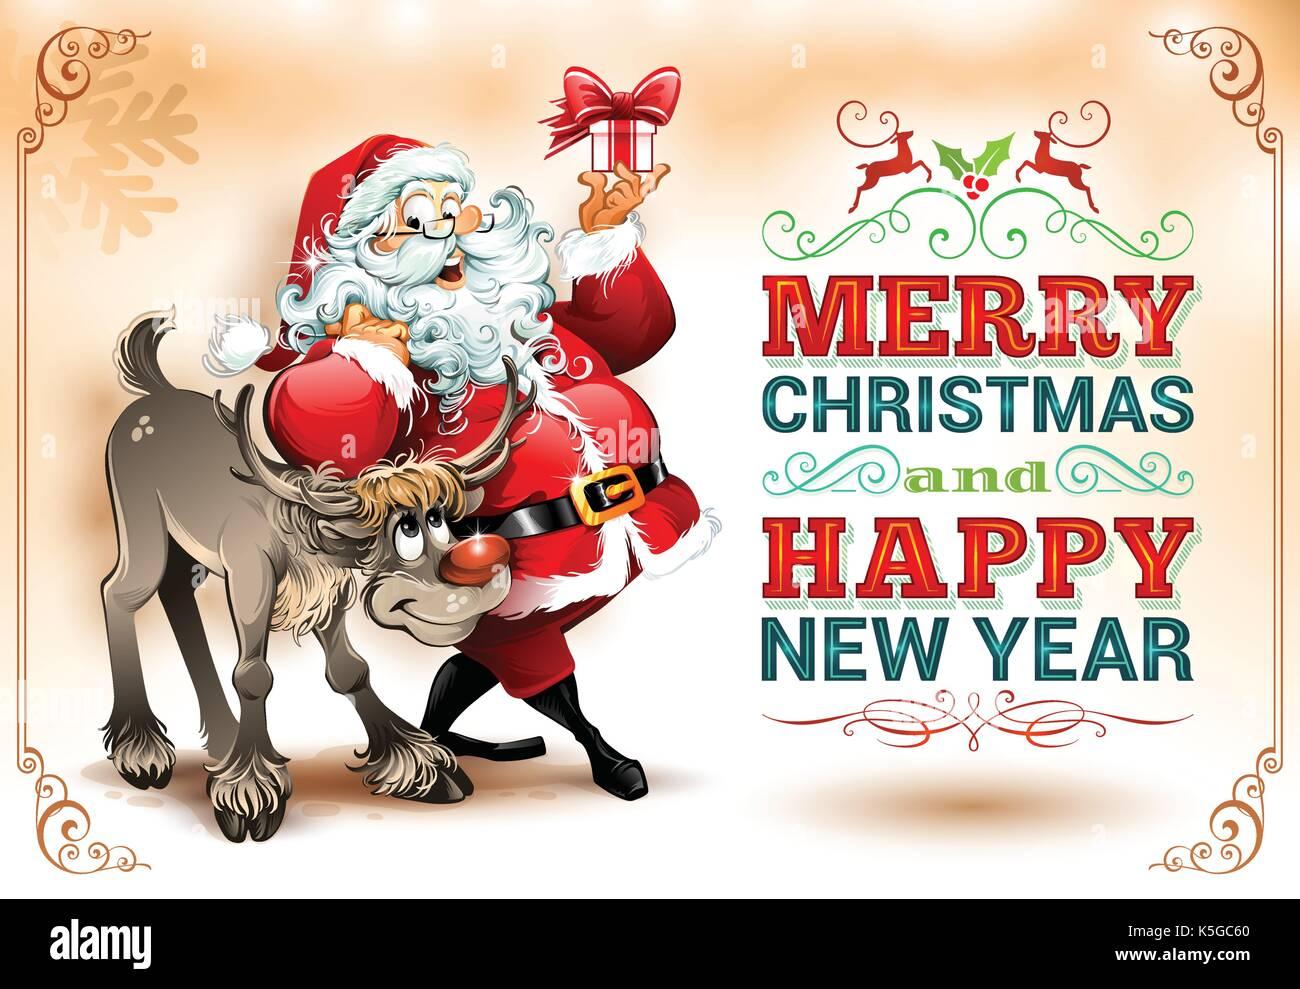 reindeer christmas vector stockfotos reindeer christmas. Black Bedroom Furniture Sets. Home Design Ideas